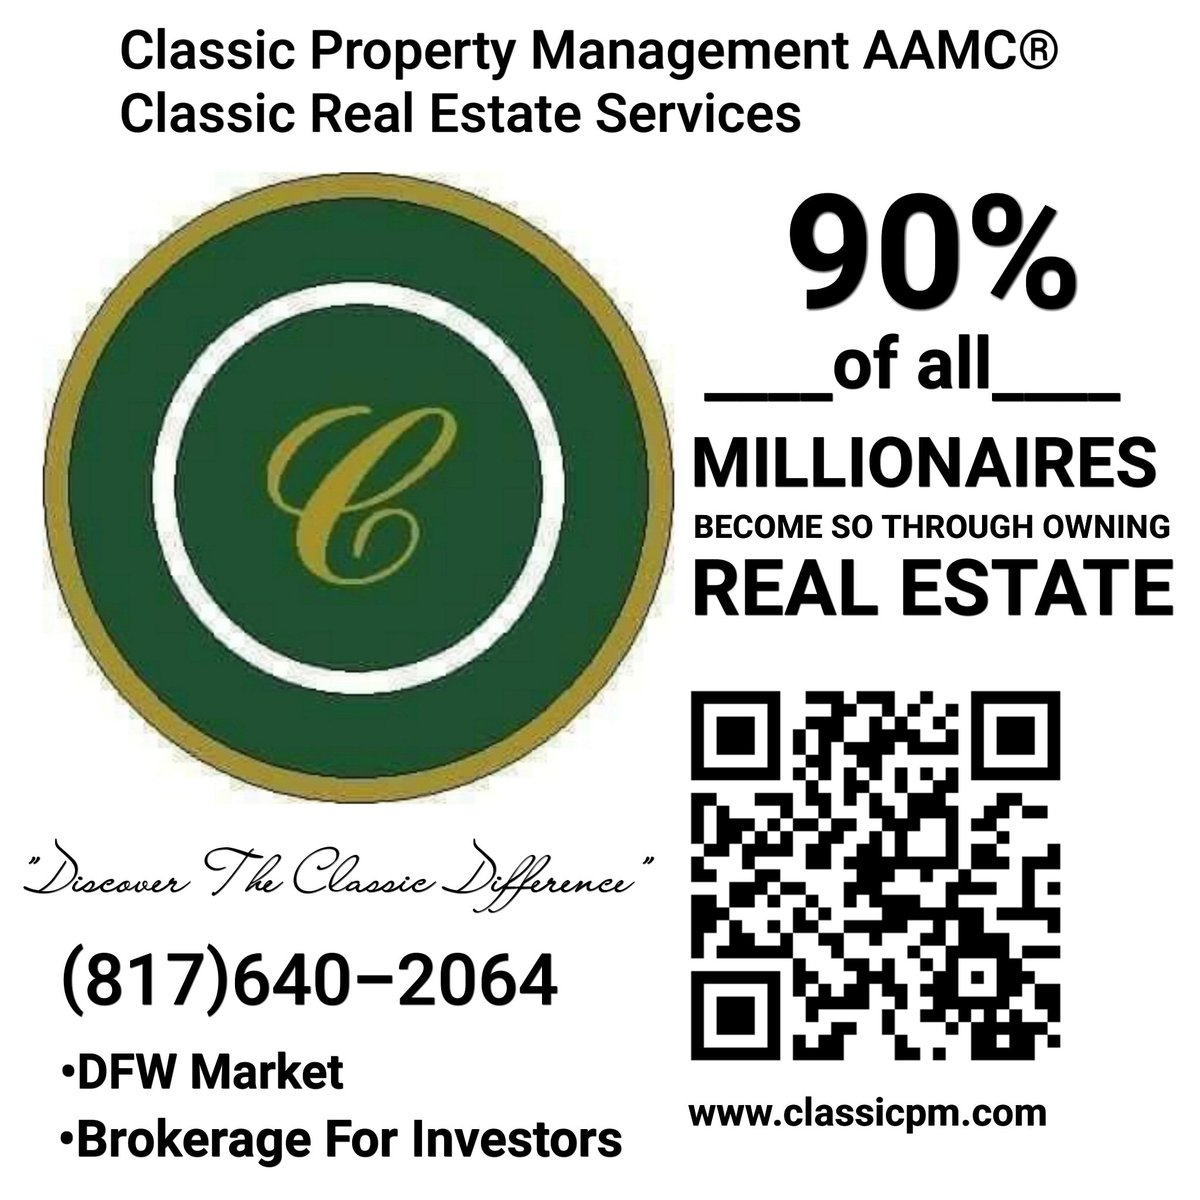 Idyllic Hastag Classic Property Management Reviews Classic Property Management Torrance Ca Classic Classic Property Management Adl Yerde Realeinvestors Photos houzz 01 Classic Property Management